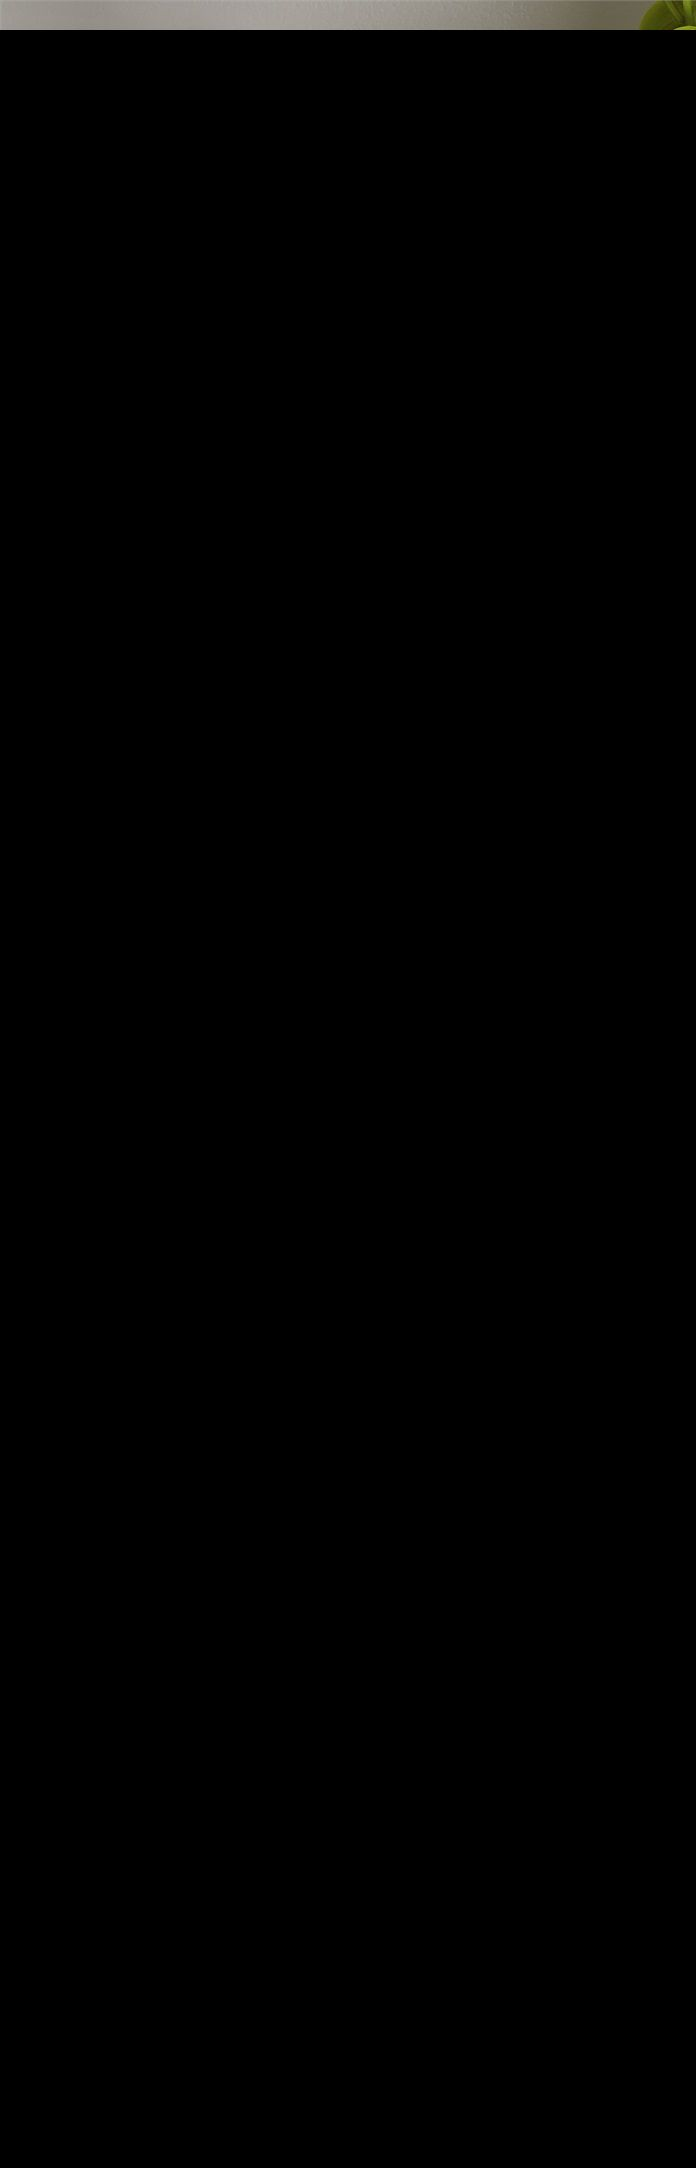 Decor | Home Decor | Accessories Home | Home Accessories | Bedroom Decor | House Accessories | House Decor | Modern Decor | Modern Accessories | Decor Online | Decor Accessories | Luxury Decor | Living Room Decor | House Decor Ideas | Bedroom Decorating I